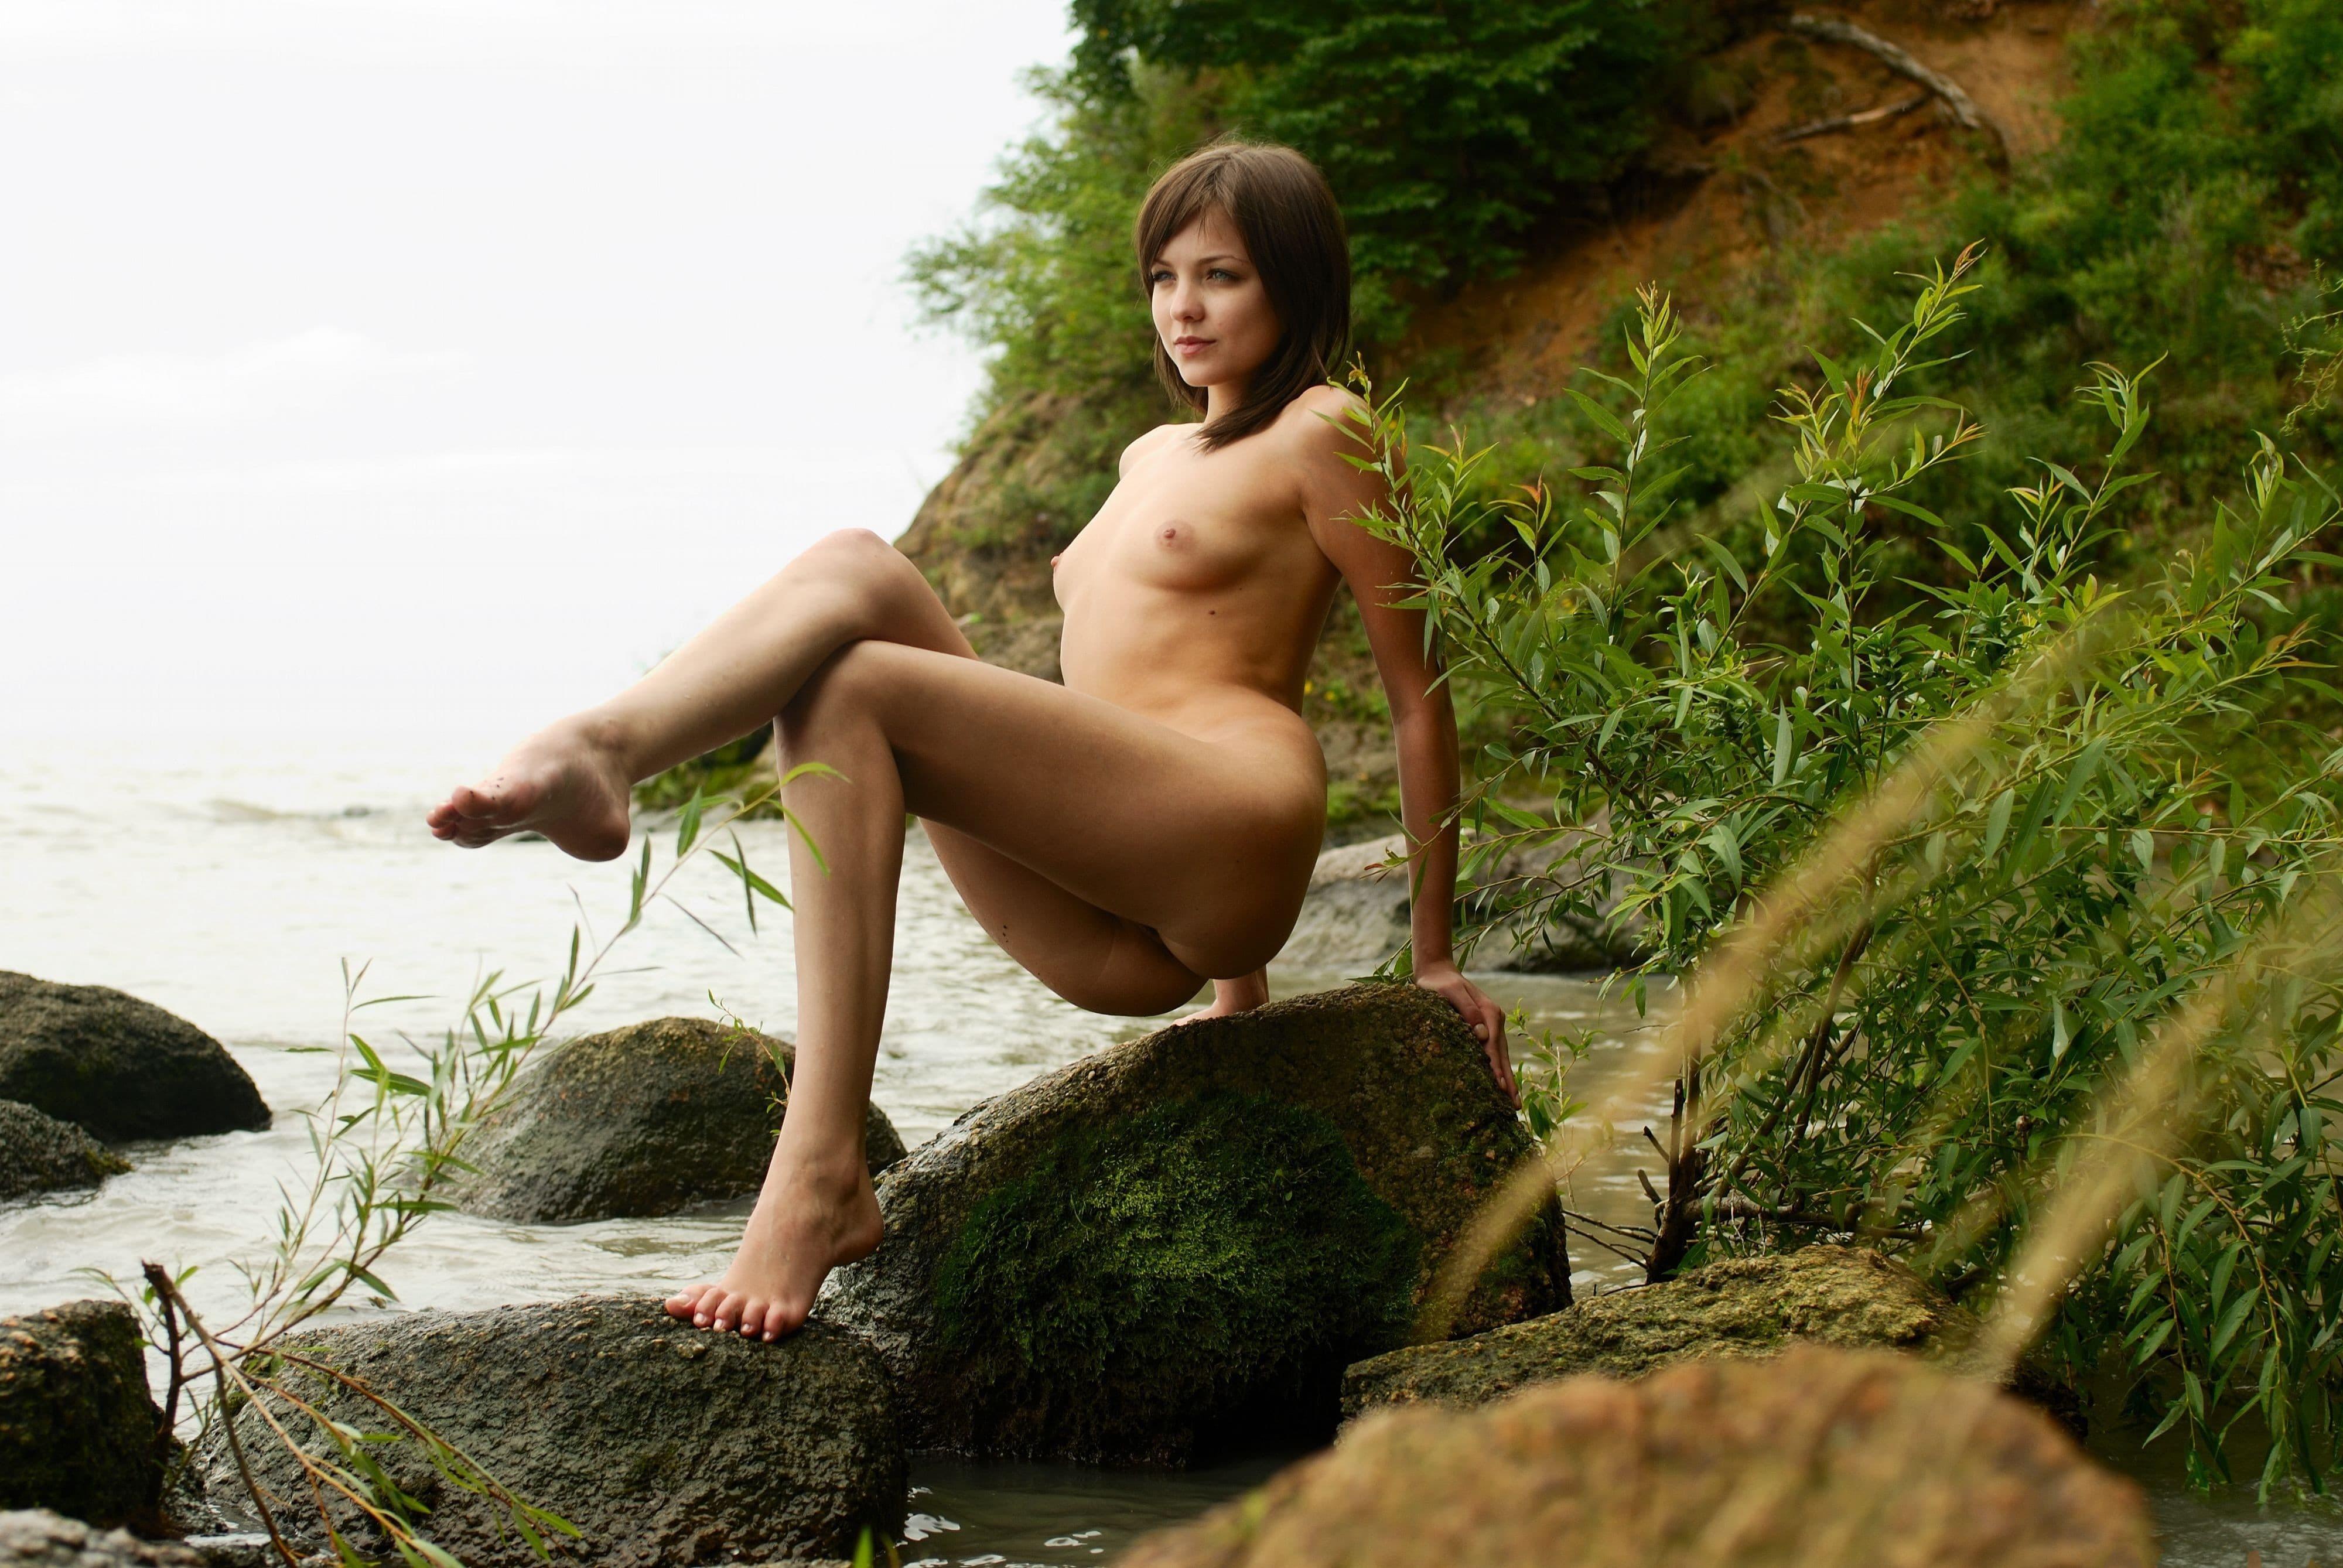 Милаха с маленькими сиськами на природе - фото